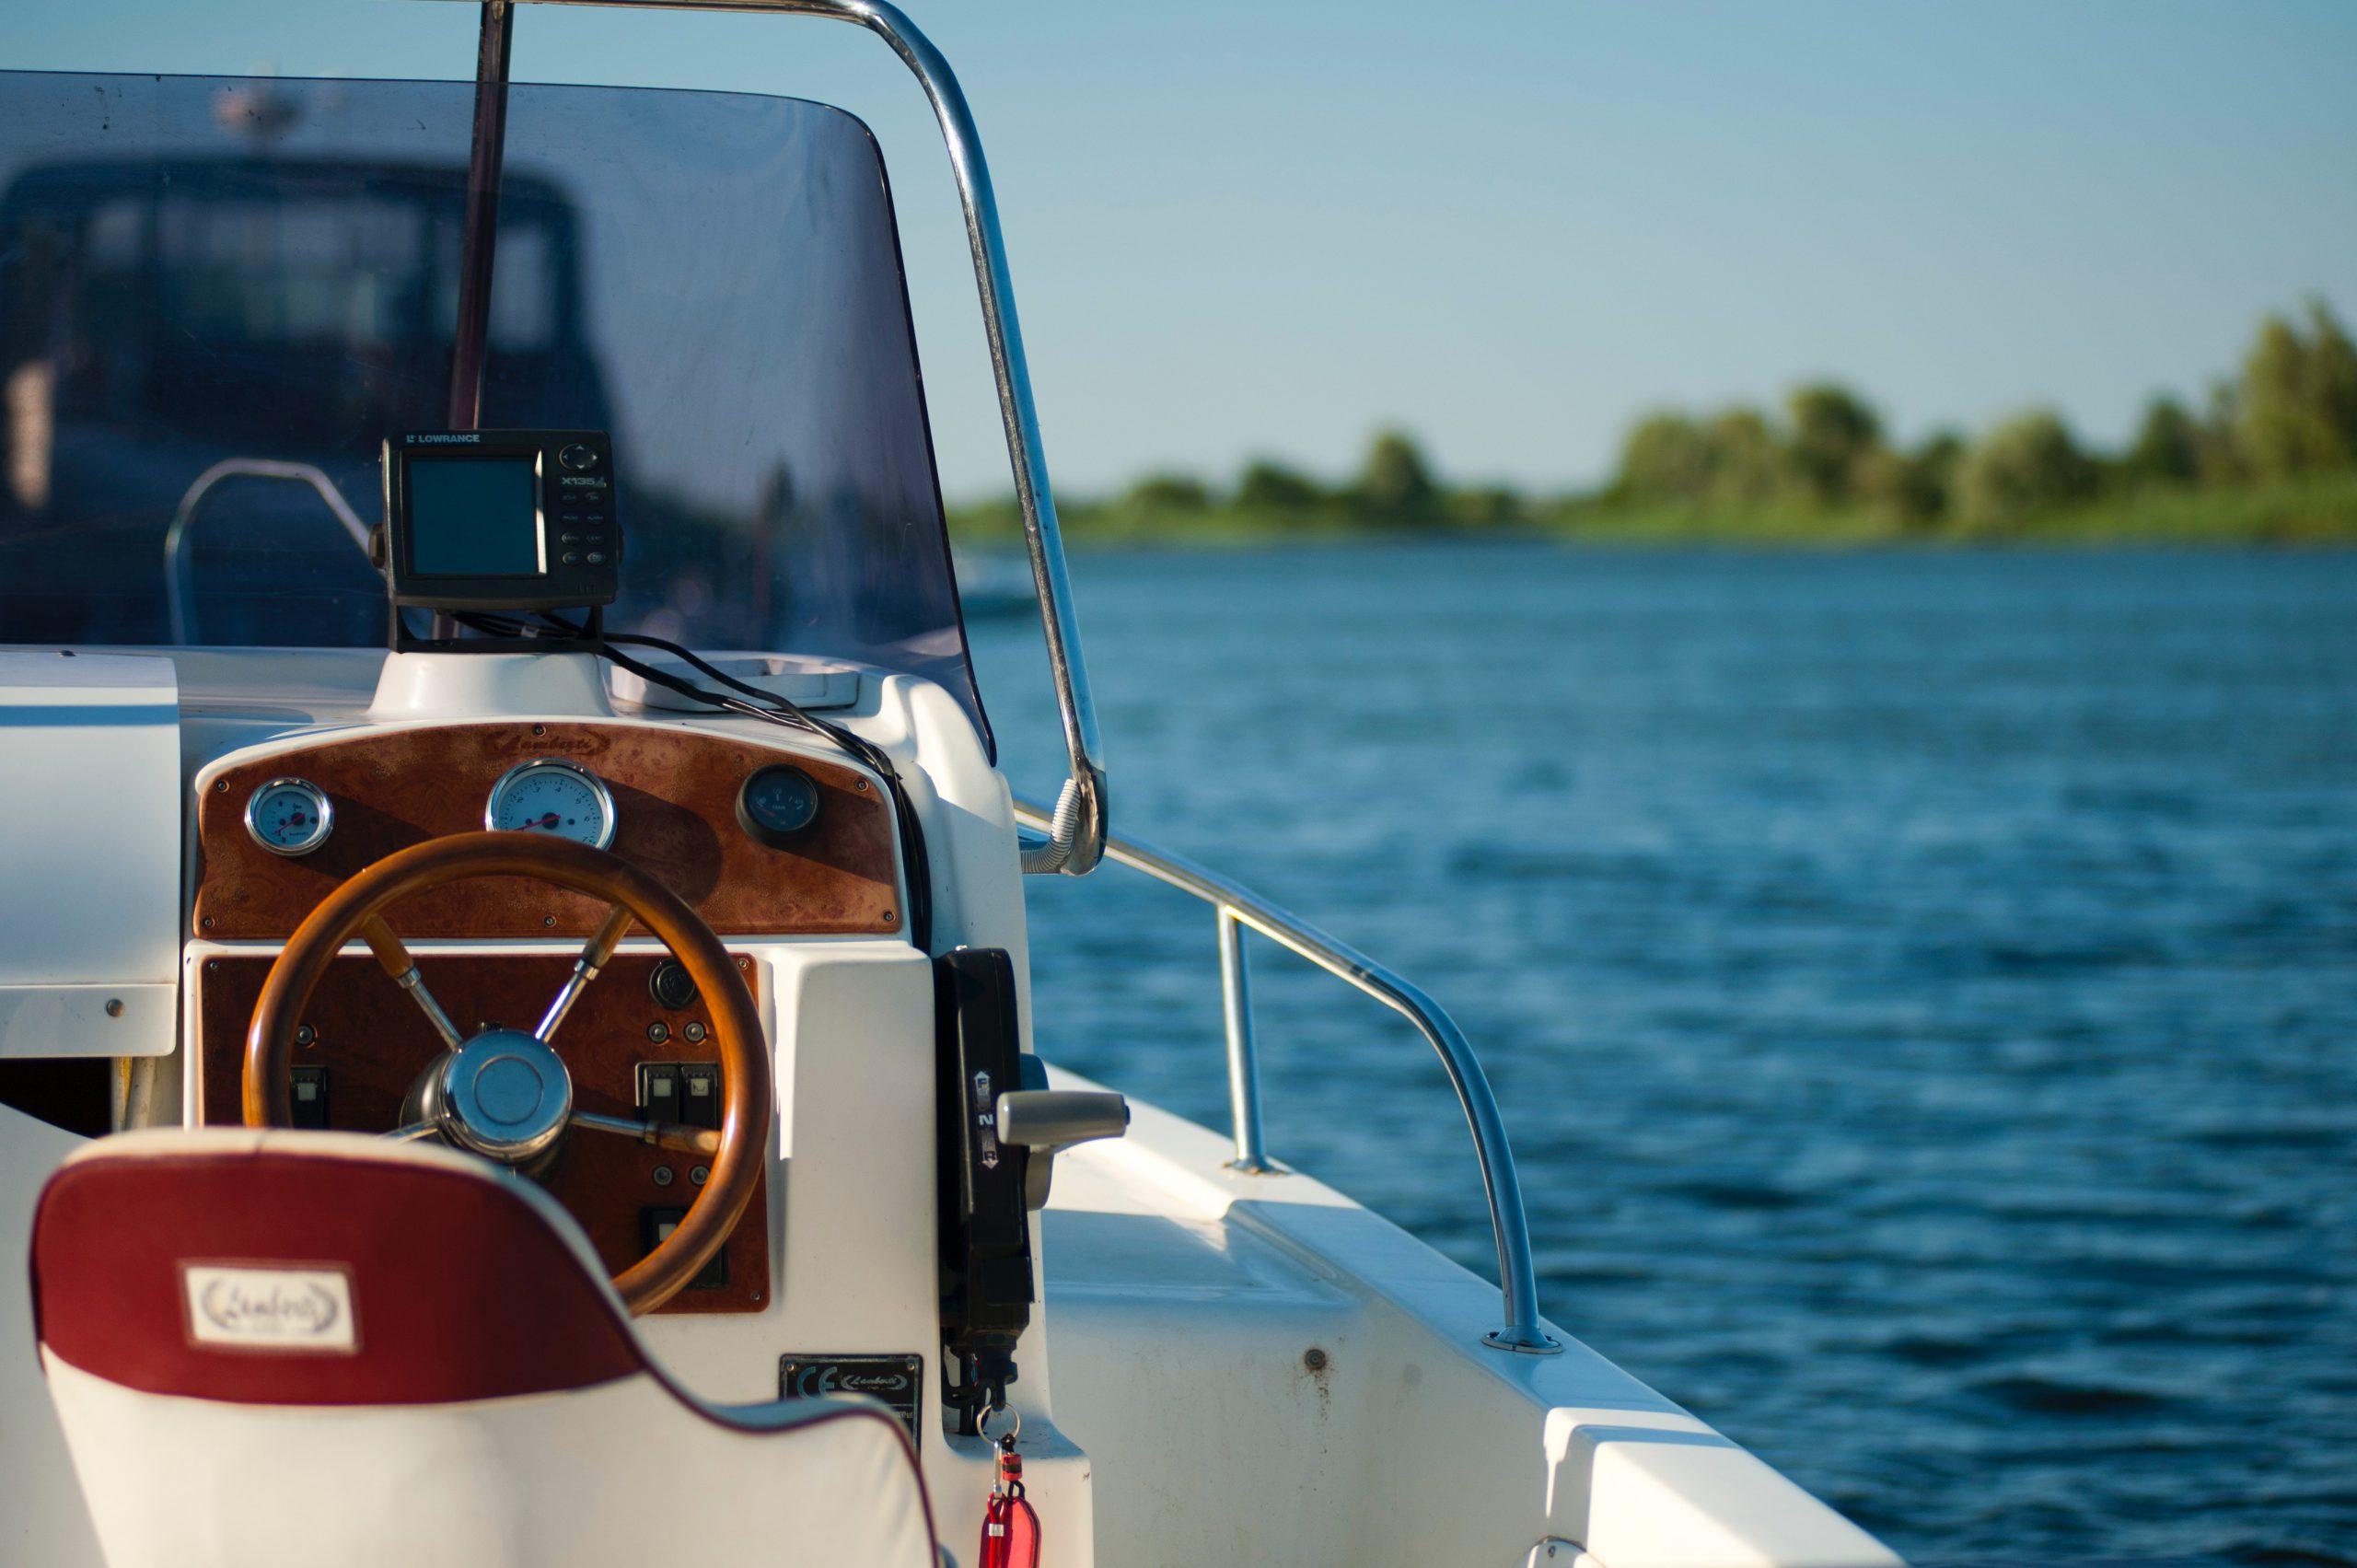 Dallas Boat Accident Injury Attorney